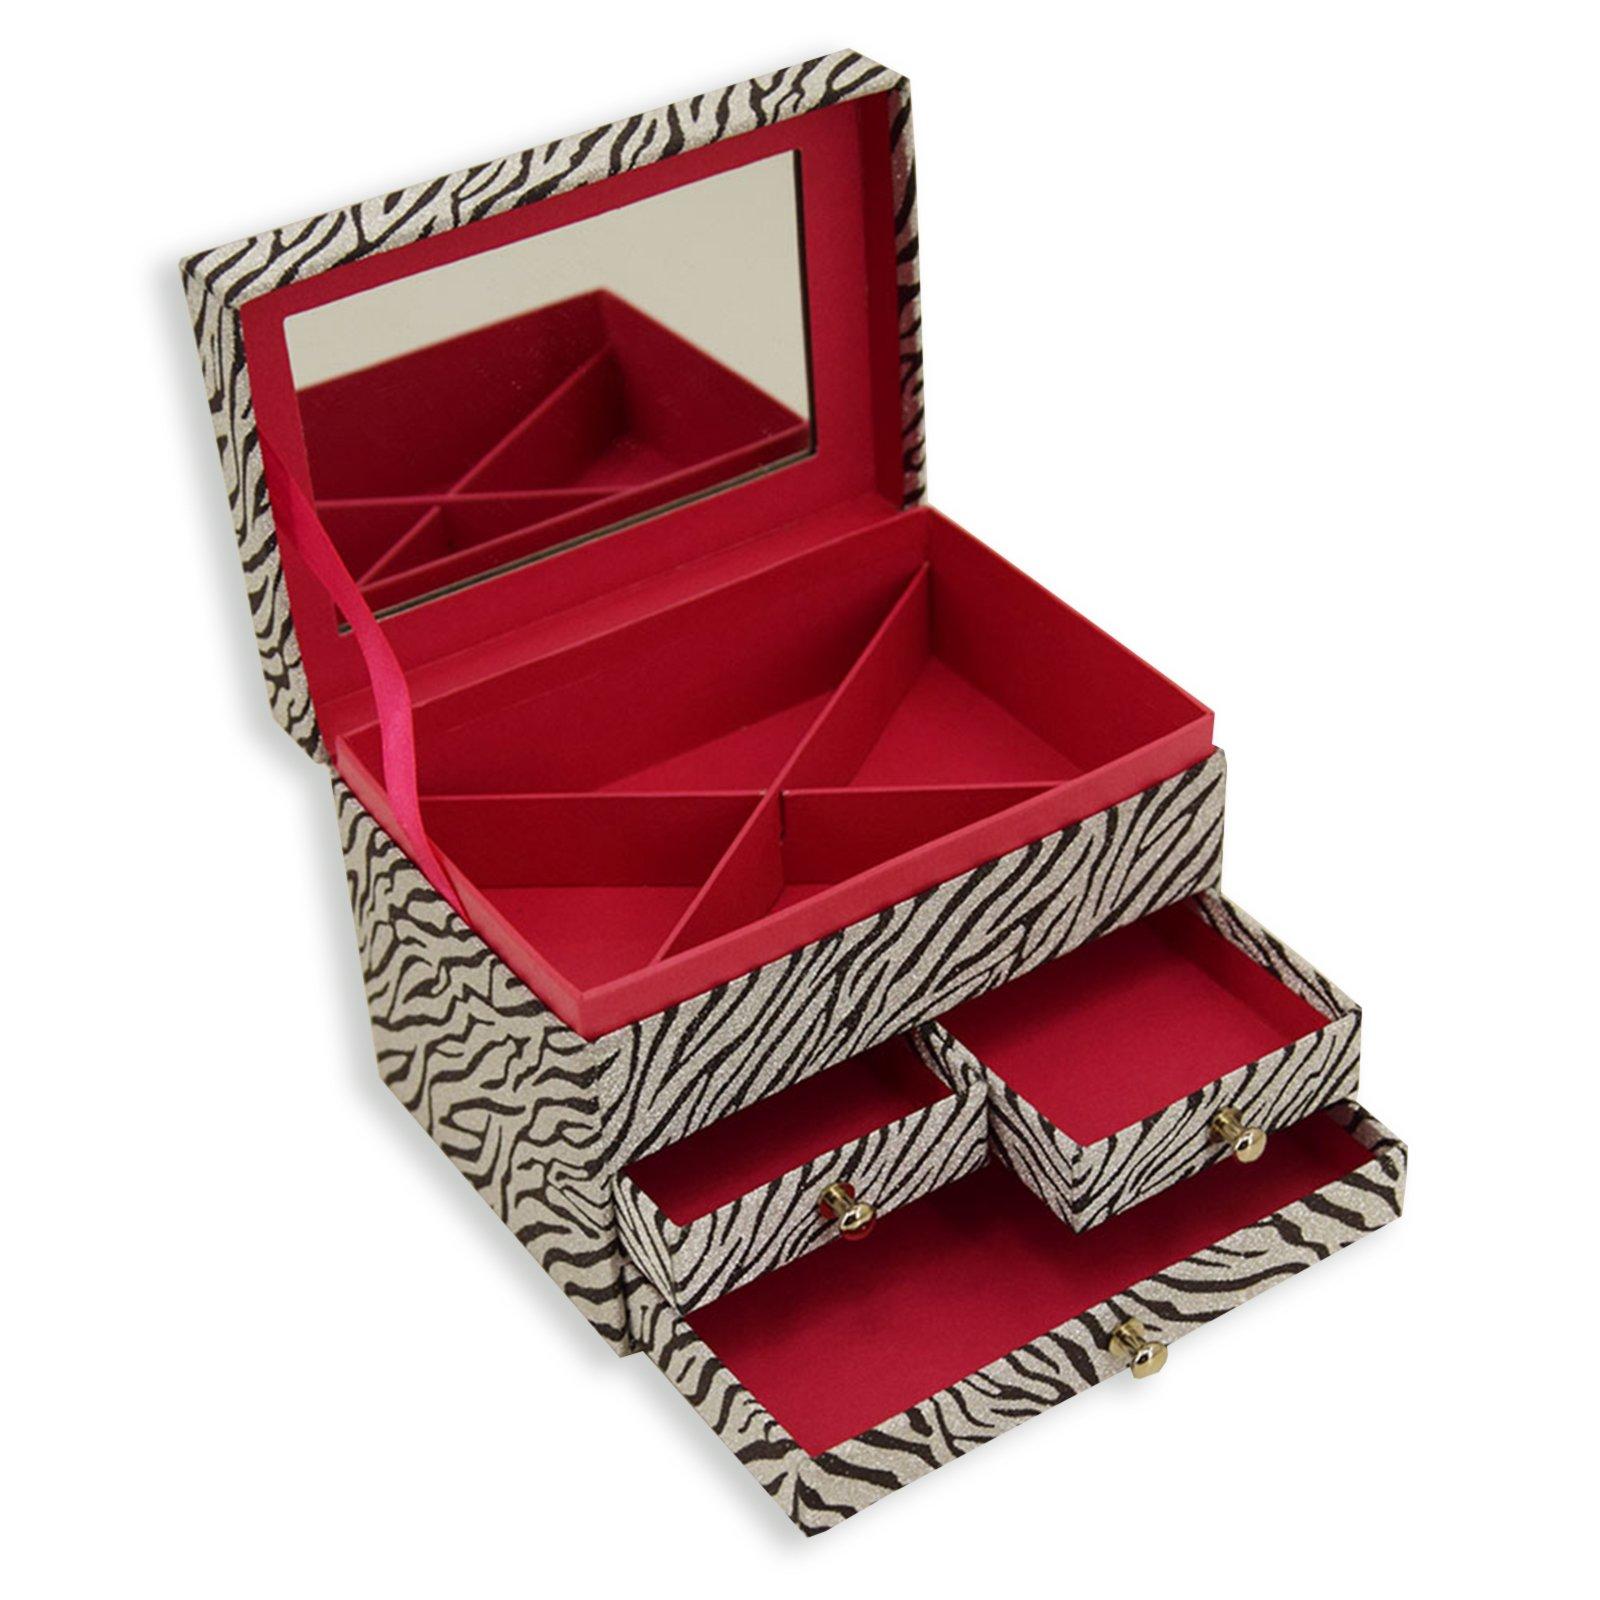 deko zebra preisvergleich. Black Bedroom Furniture Sets. Home Design Ideas